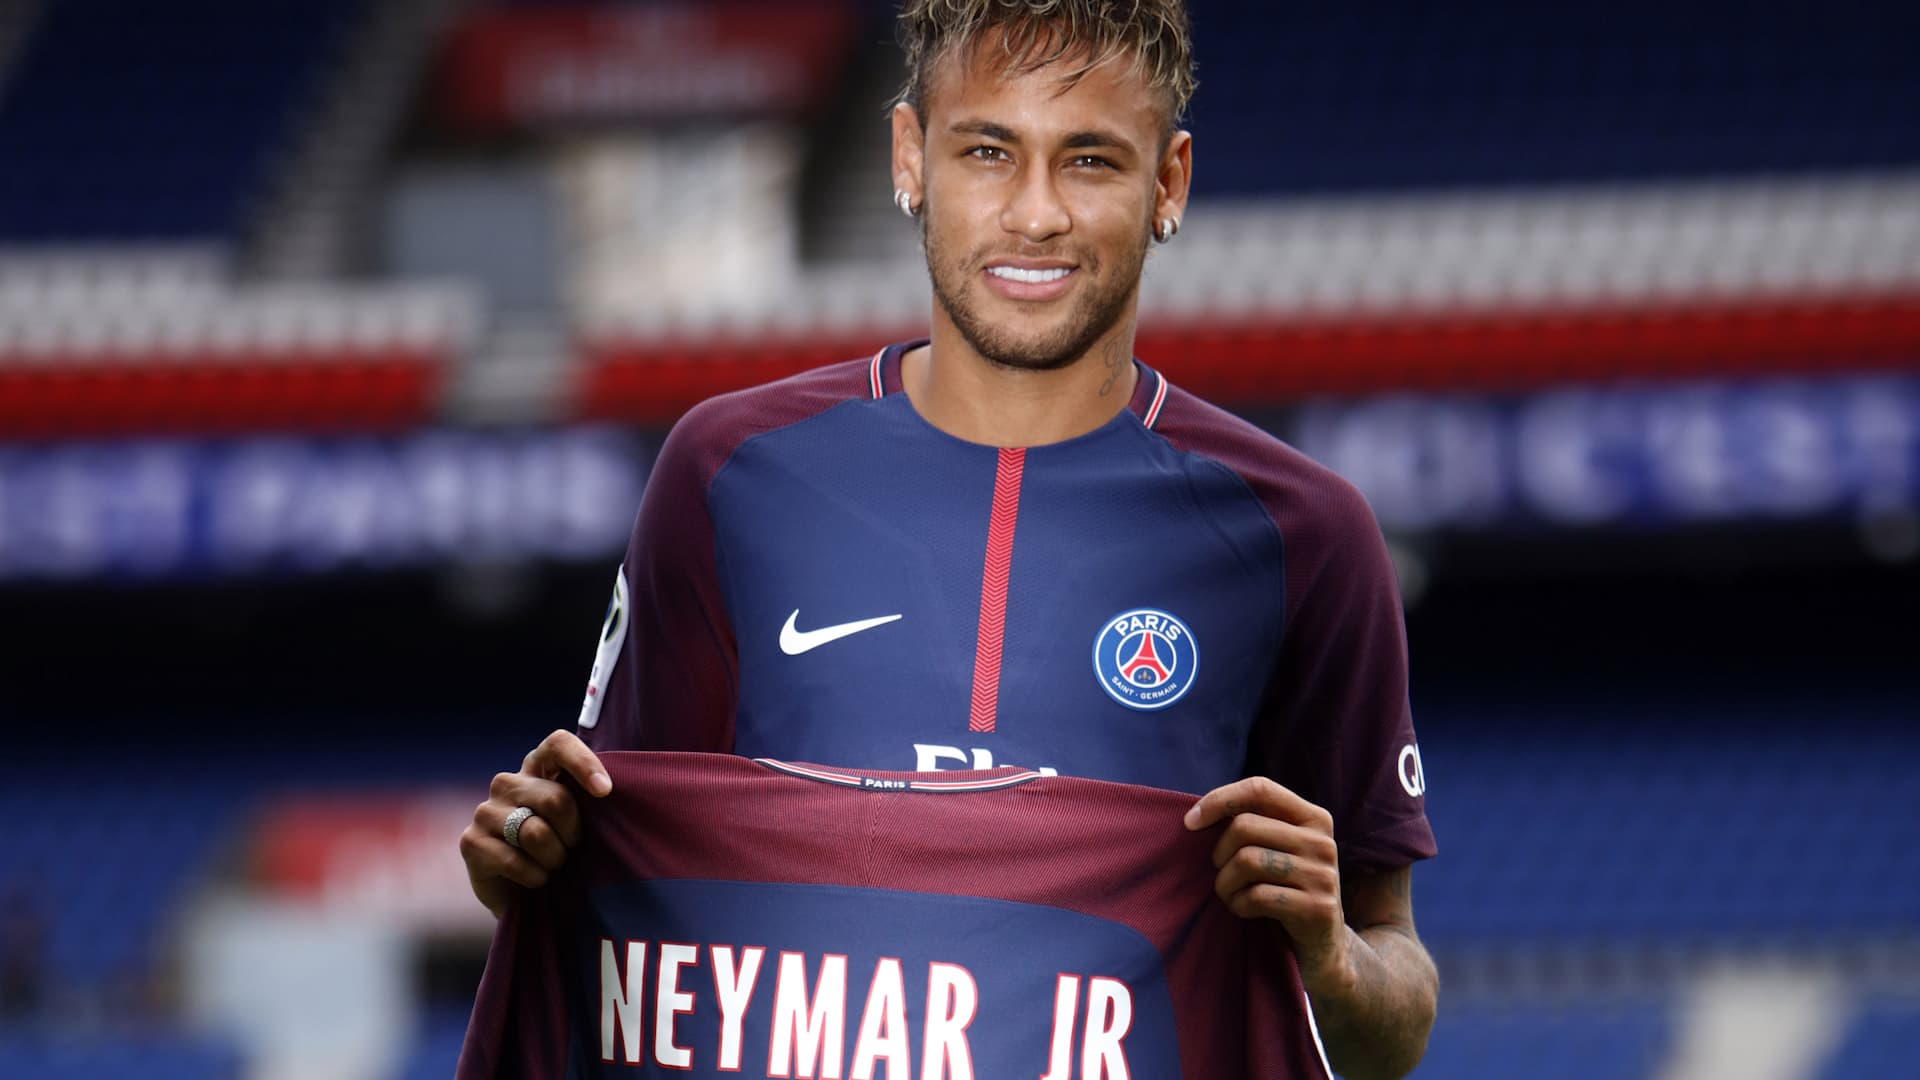 Neymar's $263 million transfer fee sets a world record